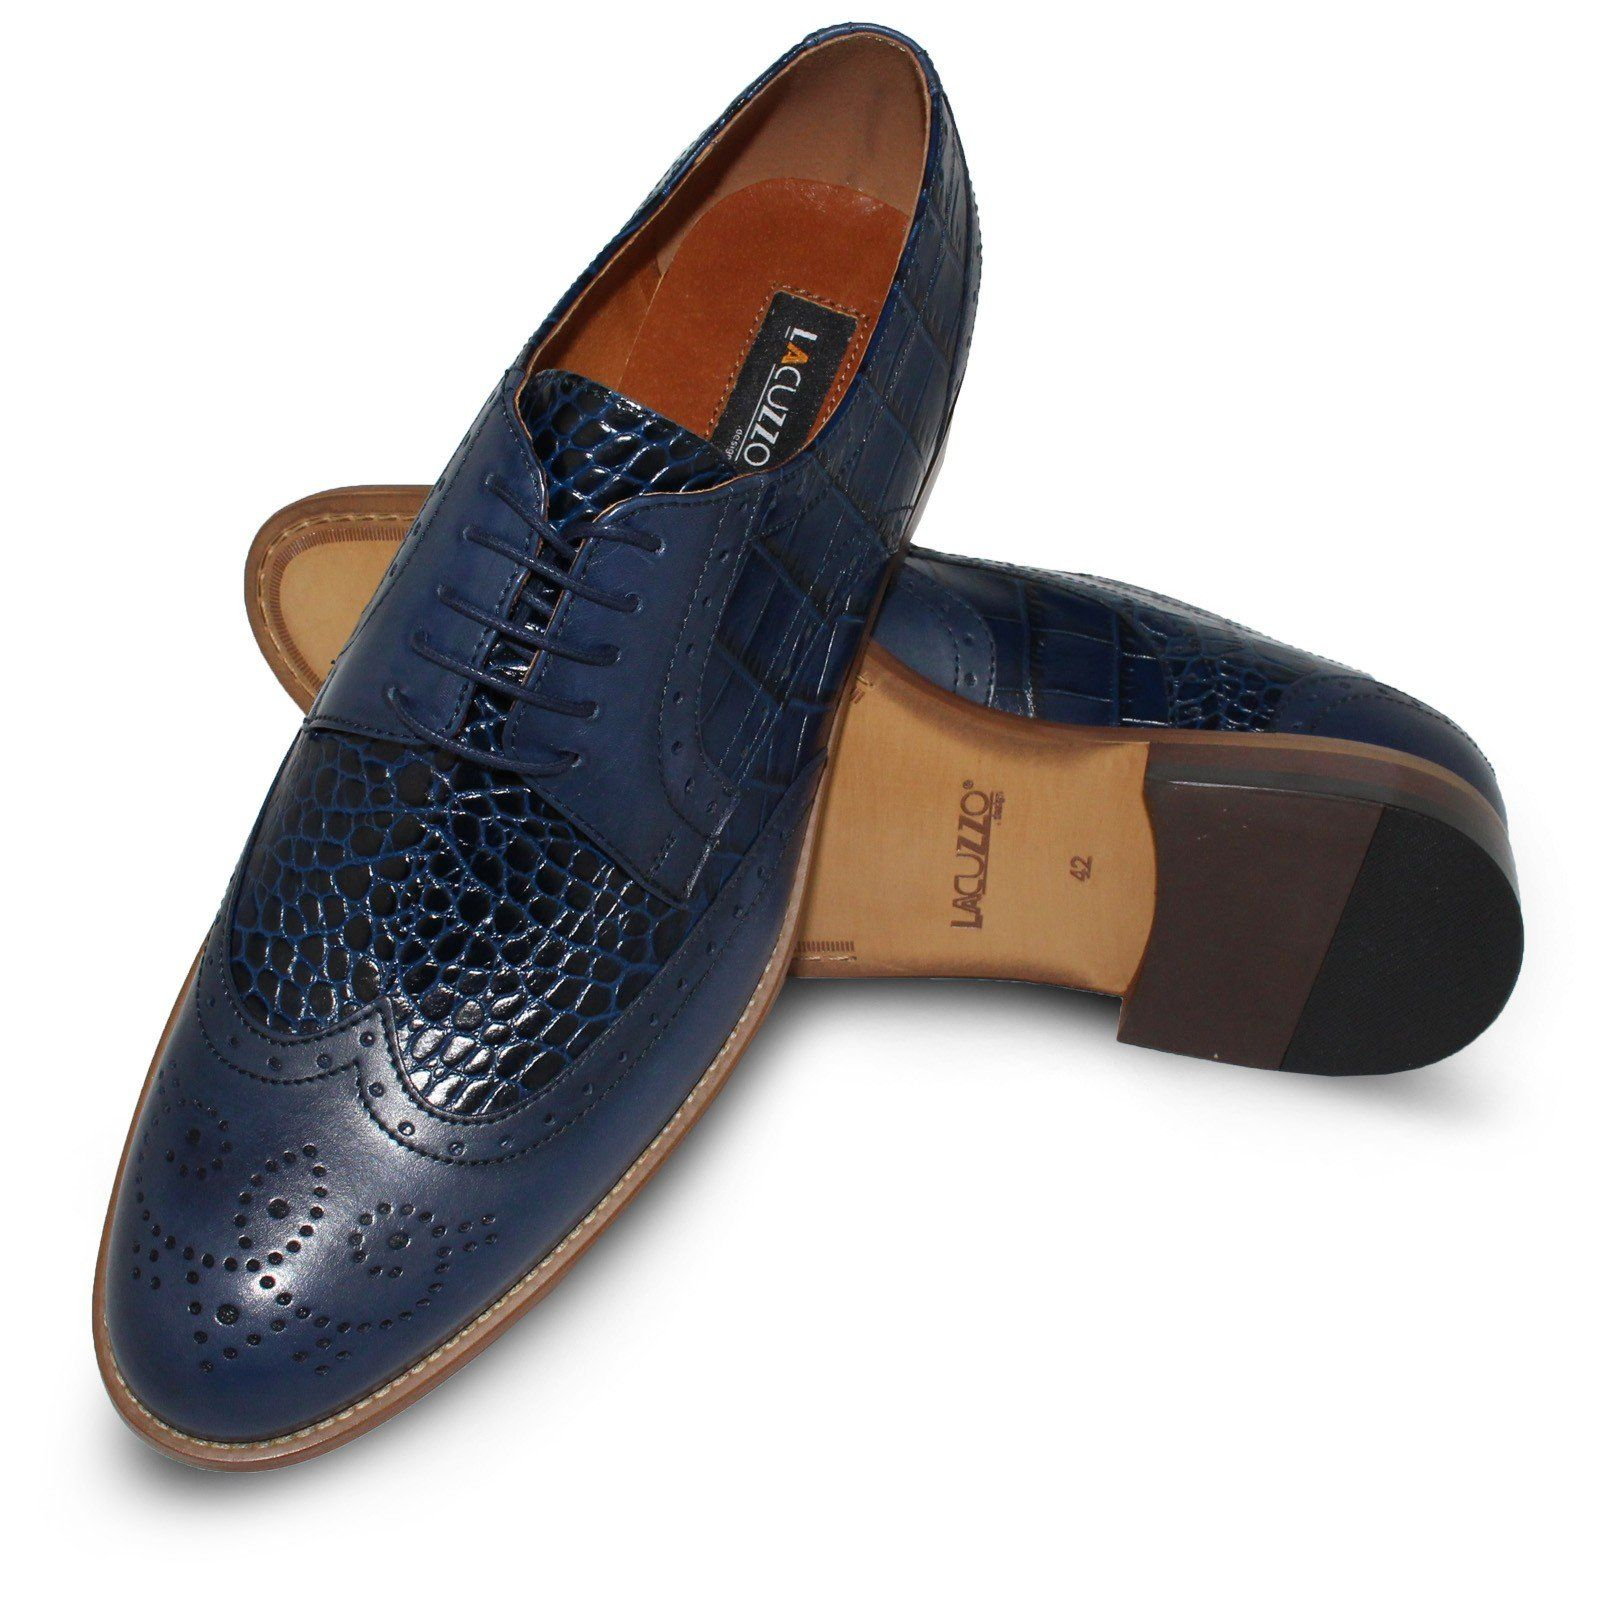 Lacuzzo Mens Leather Designer Dress Casual Retro Sole Formal Shoes Black